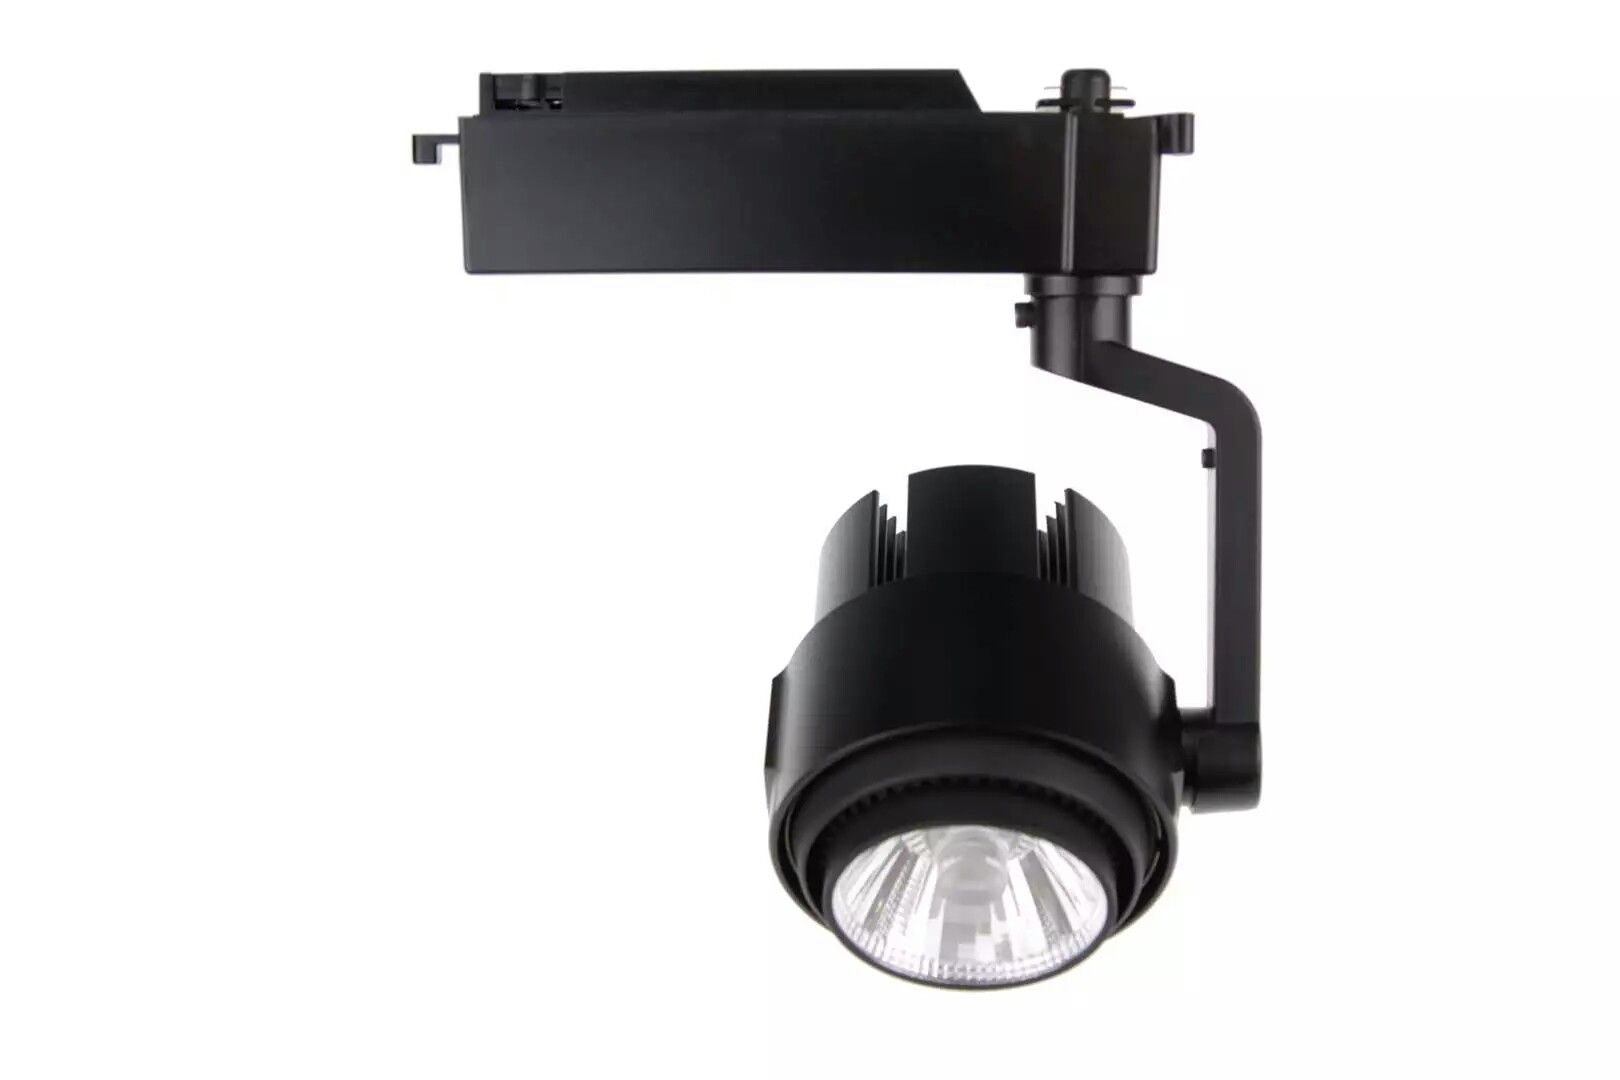 huge discount 30fe7 9d34d Favorable wide power range led head moving light track light ...